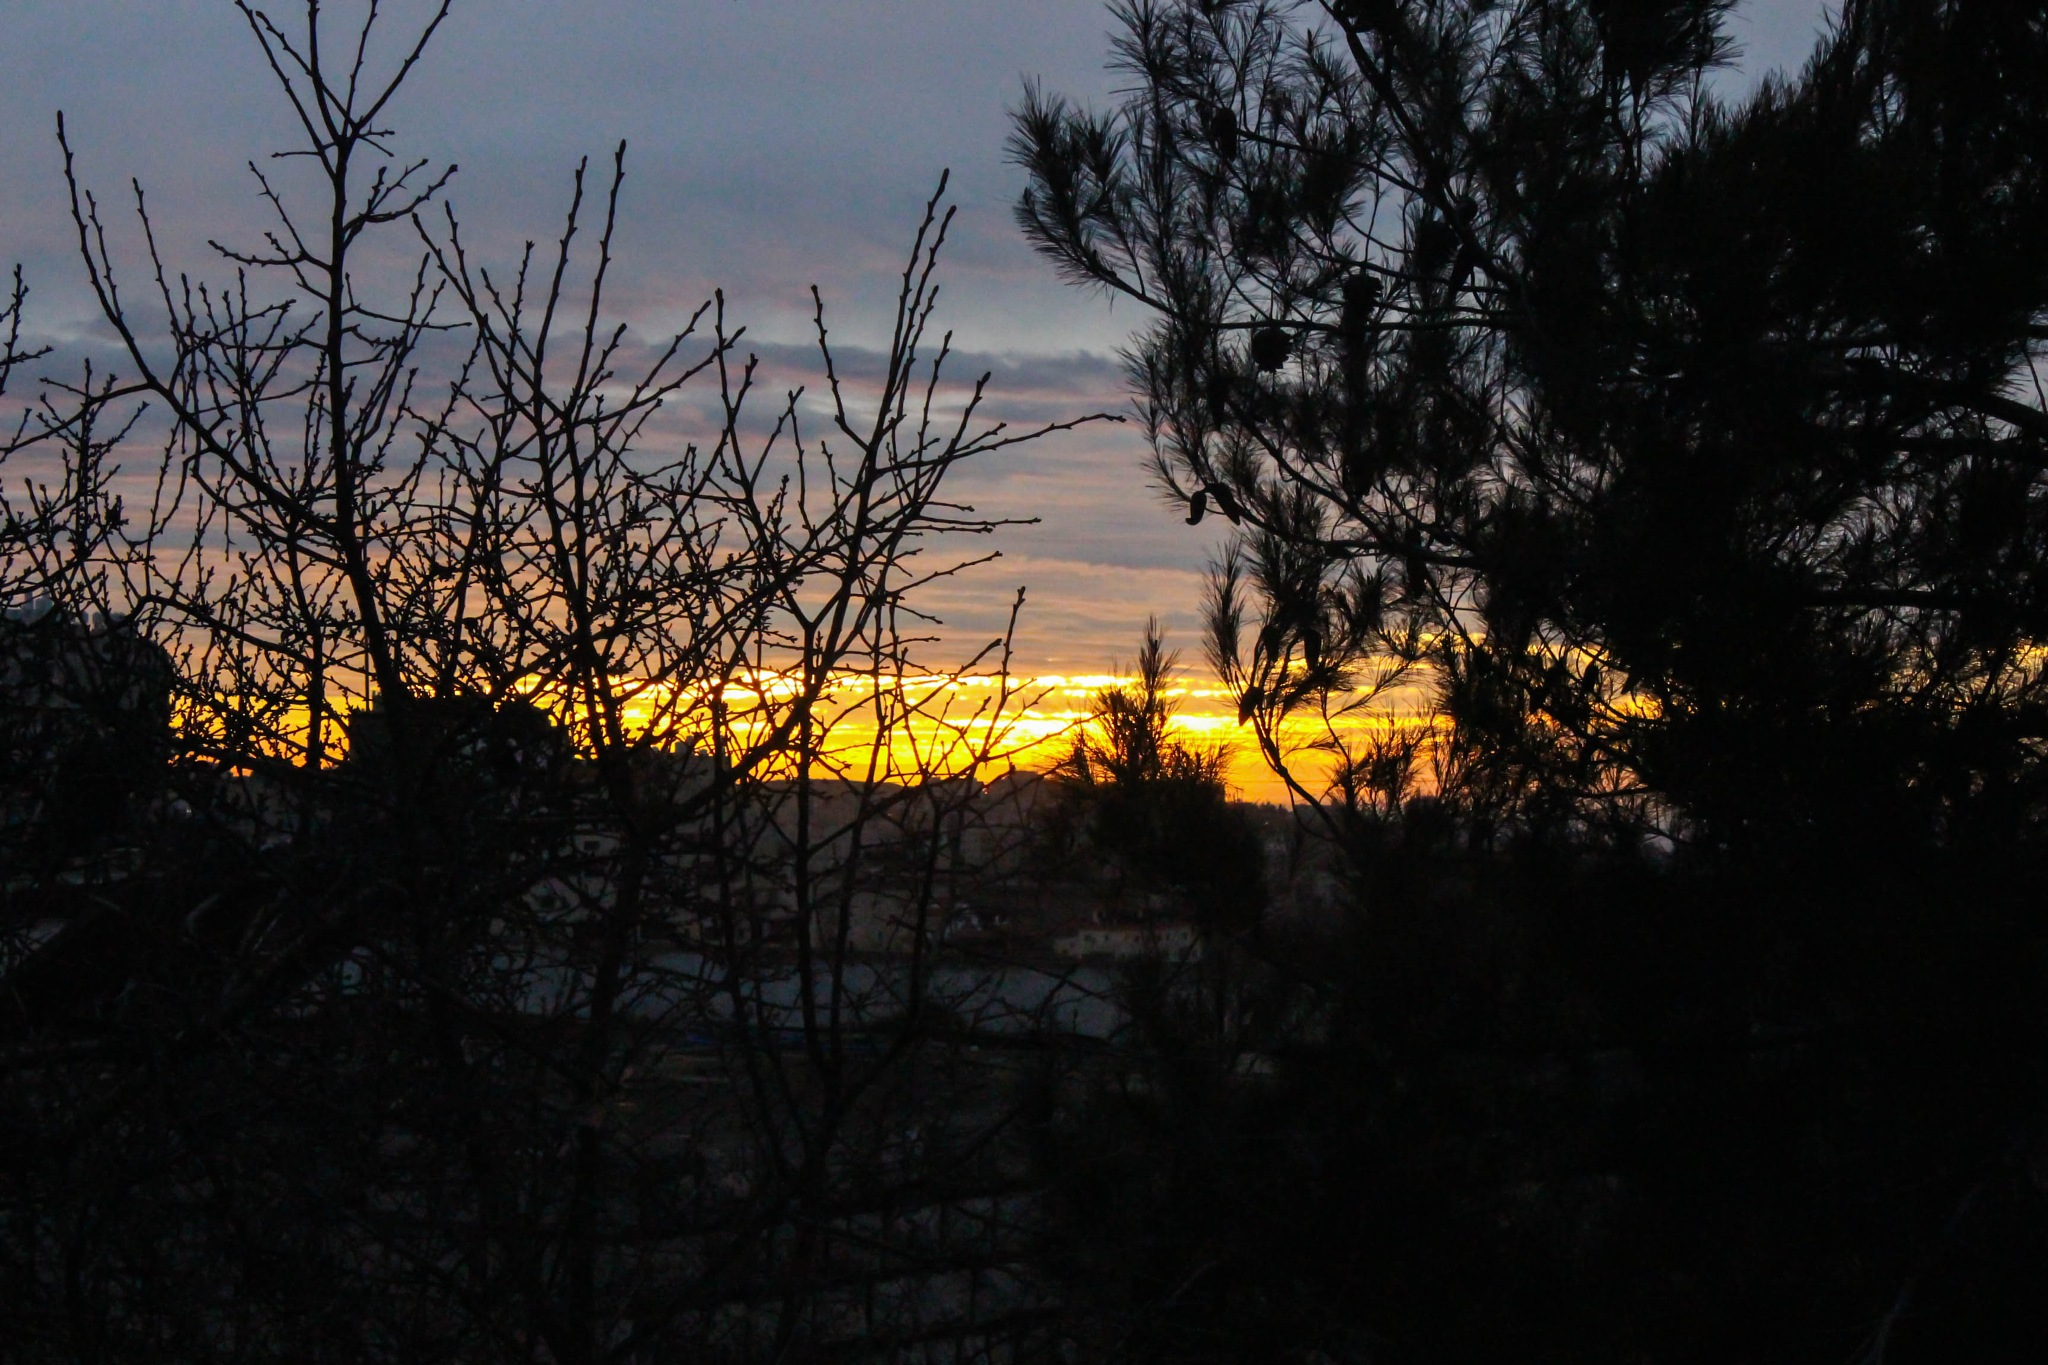 November Sunset by samahannoun